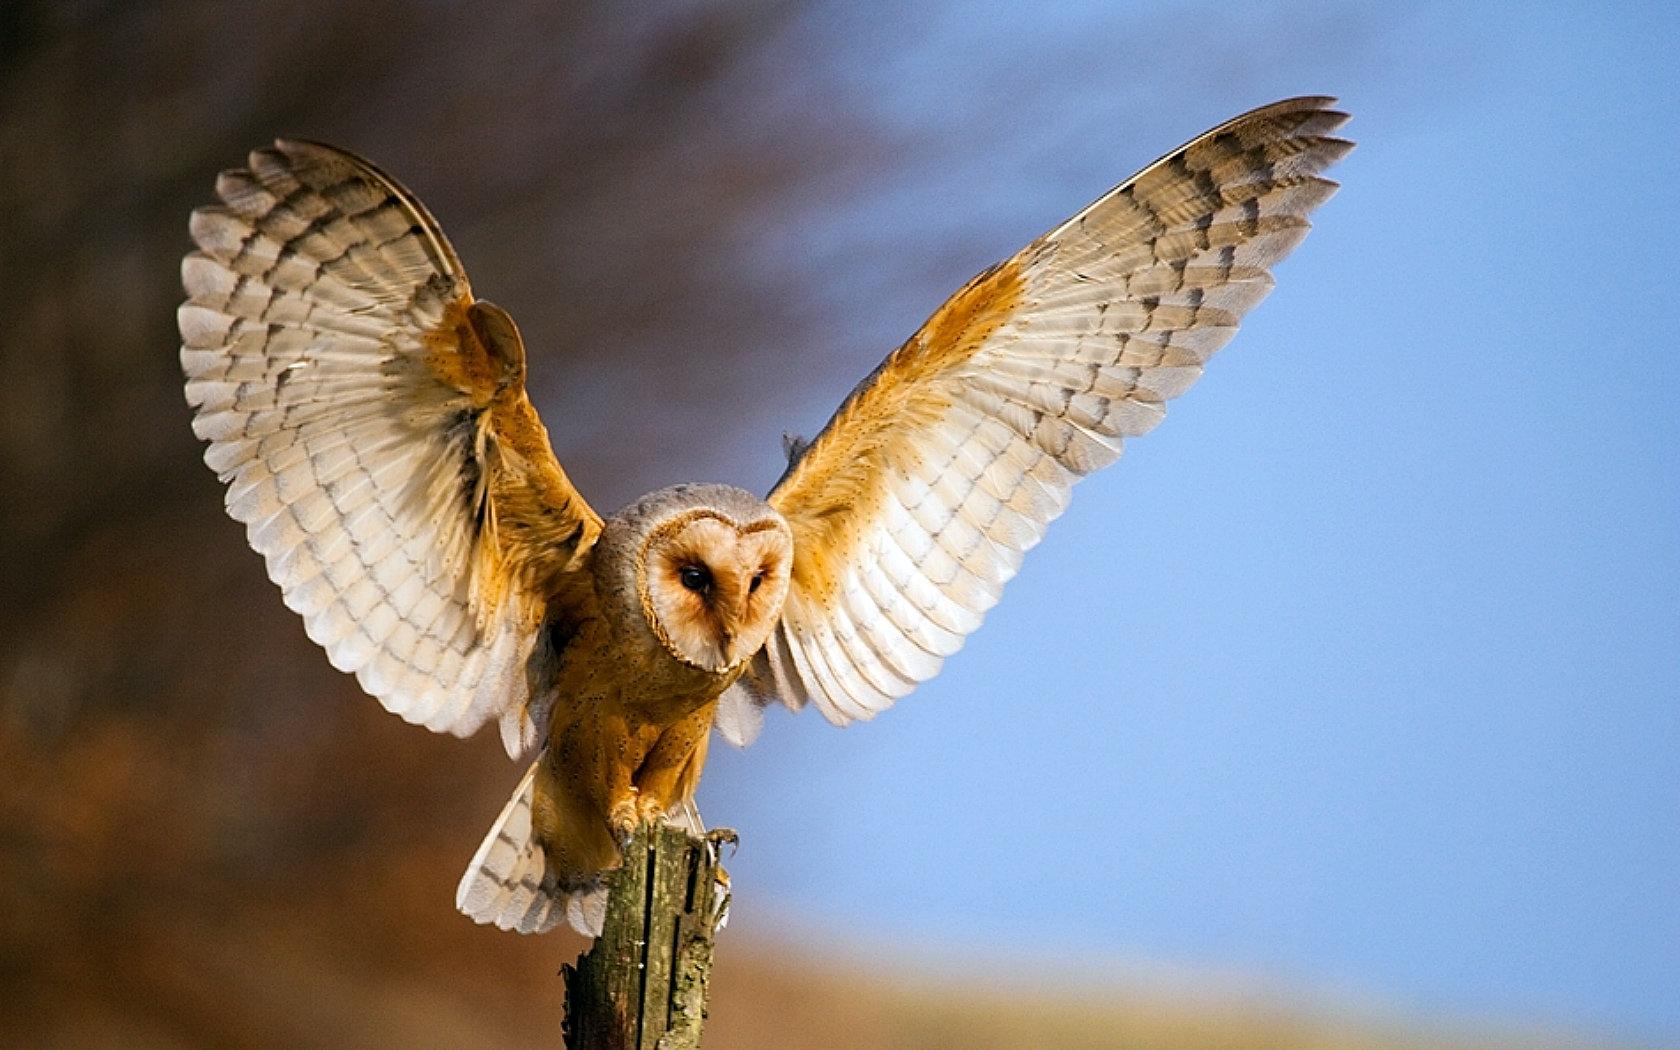 Awesome Barn Owl Free Wallpaper Id Barn Owl Wing Span 1680x1050 Download Hd Wallpaper Wallpapertip